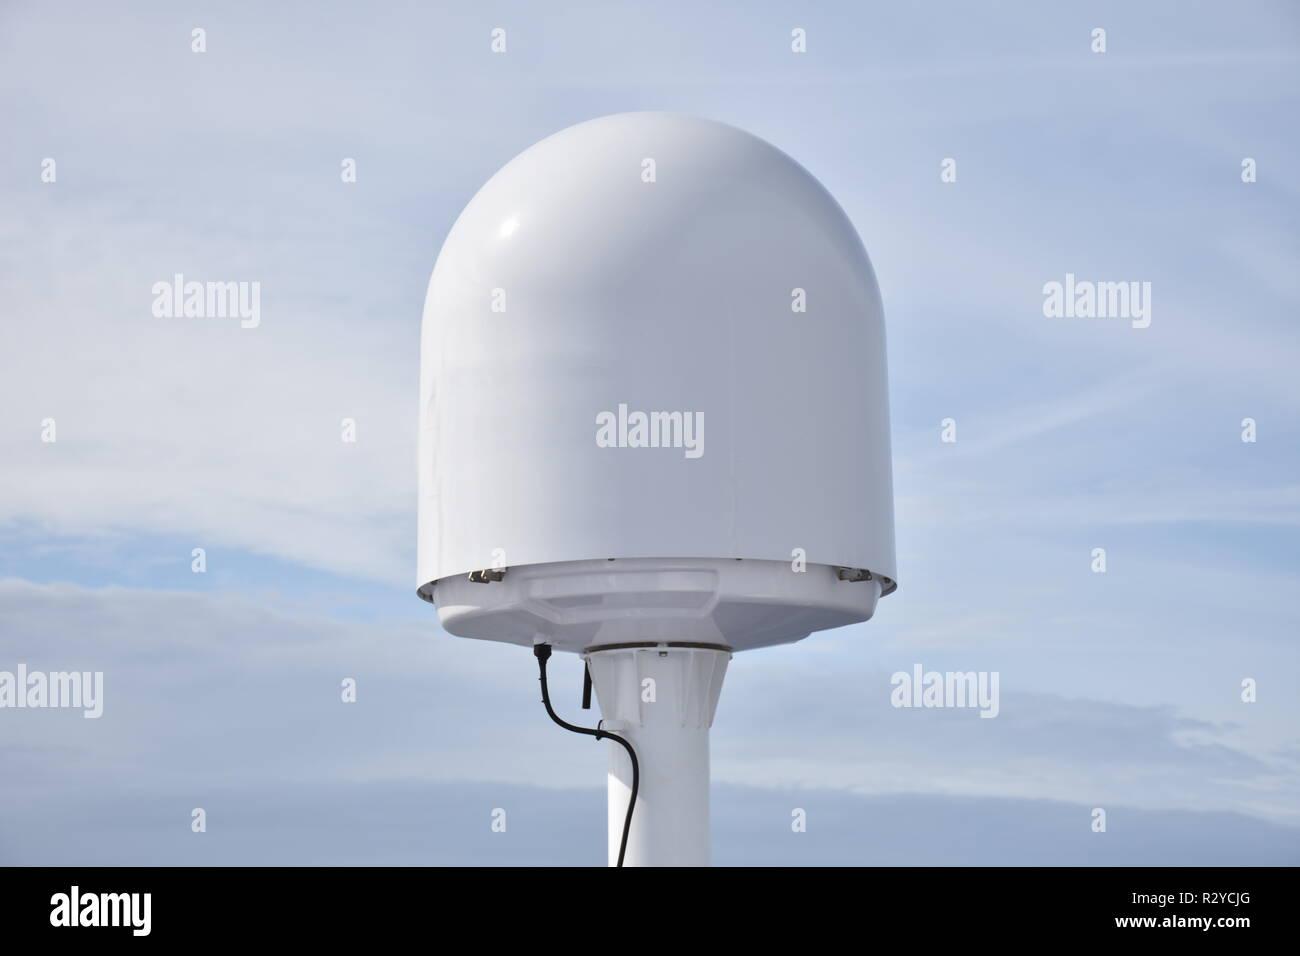 Antenne, Schiff, Seefahrt, Satellitentelefon, Satelliteninternet, Navigation, GPS, Satellitenantenne, seefest, Inmarsat, Satellit, Drehantenne, Antenn Stockbild